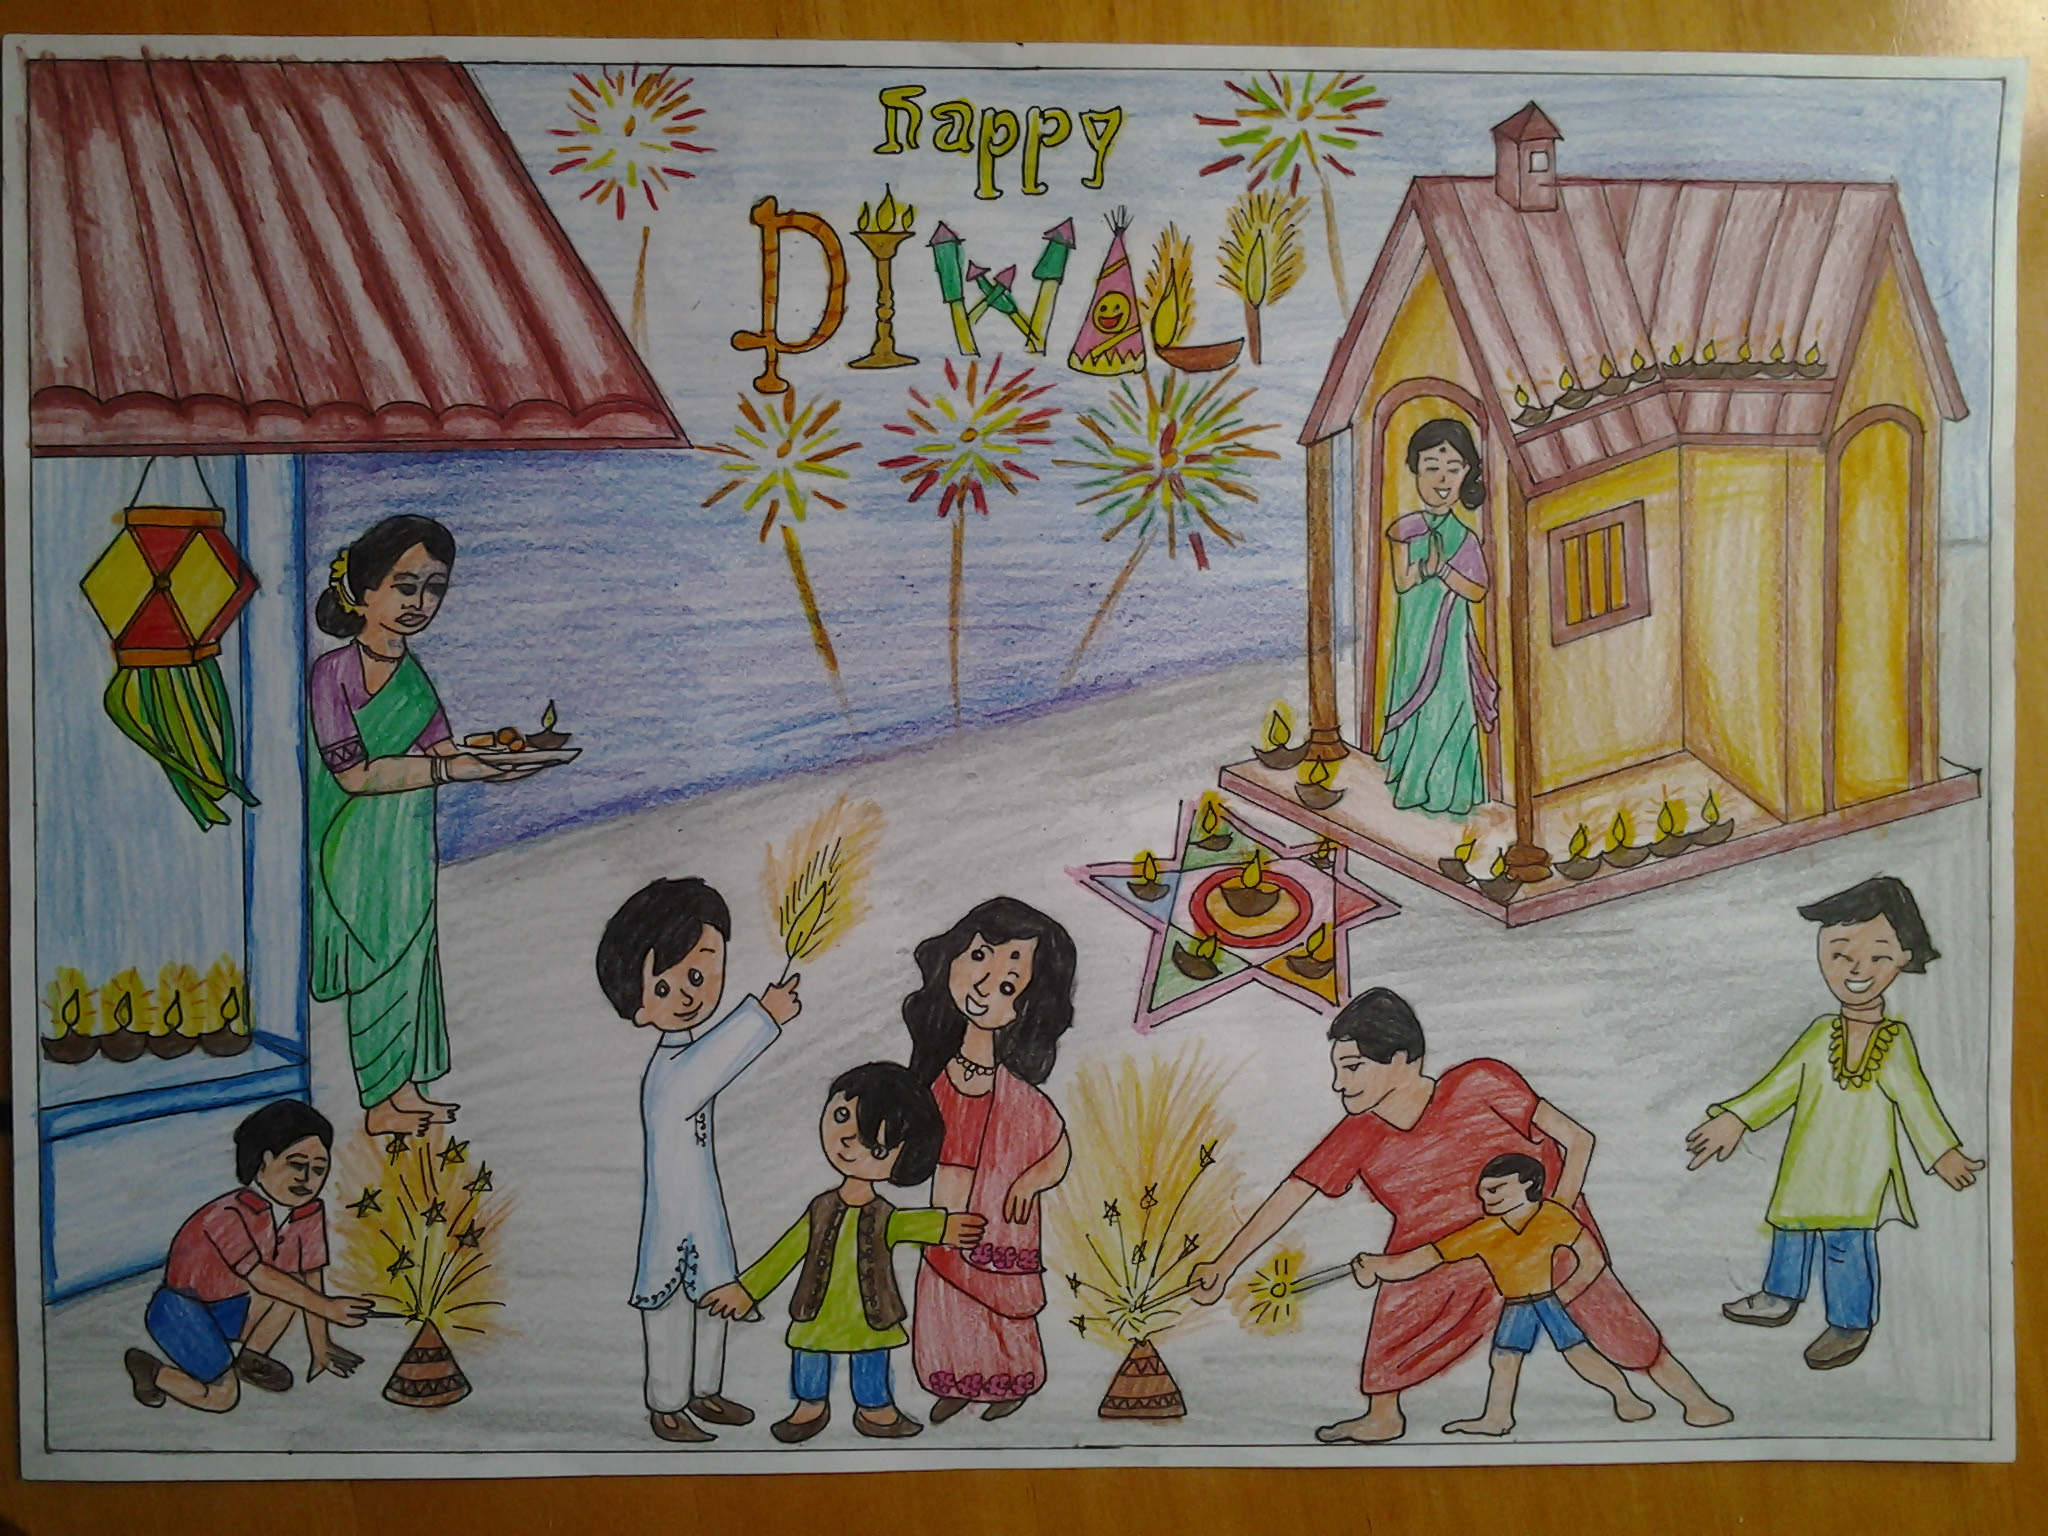 2048x1536 Talentzhub Happy Diwali